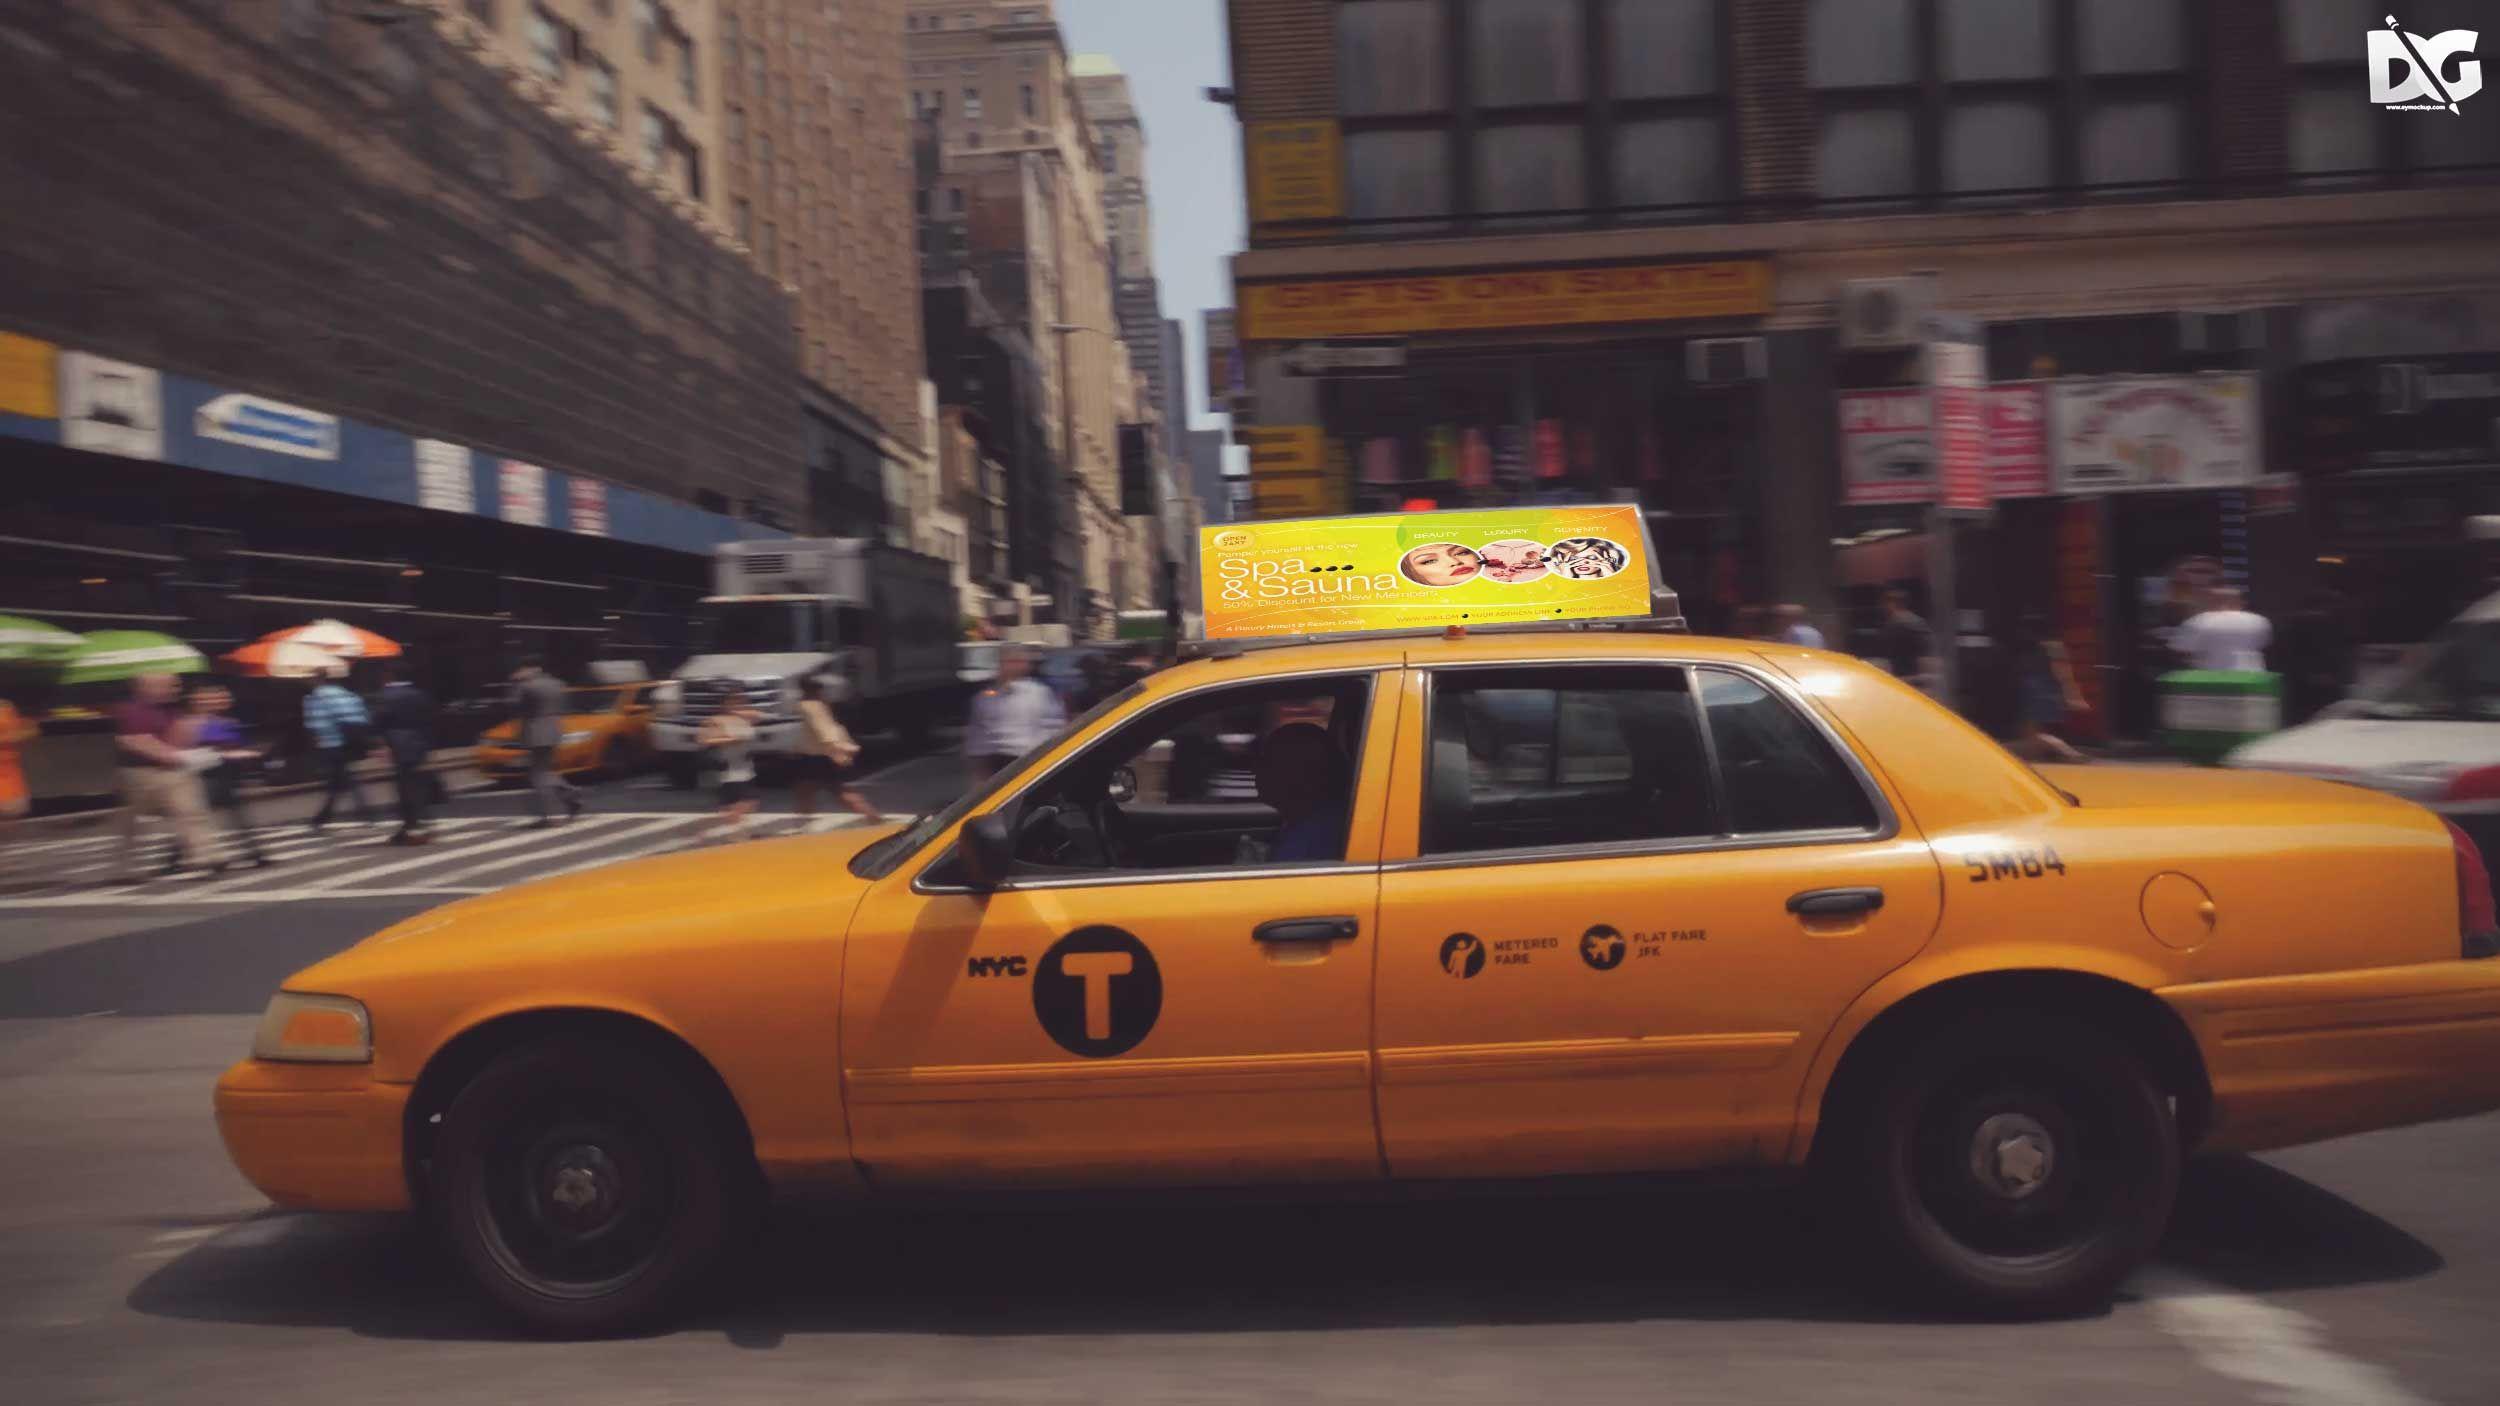 Taxi ad mockup